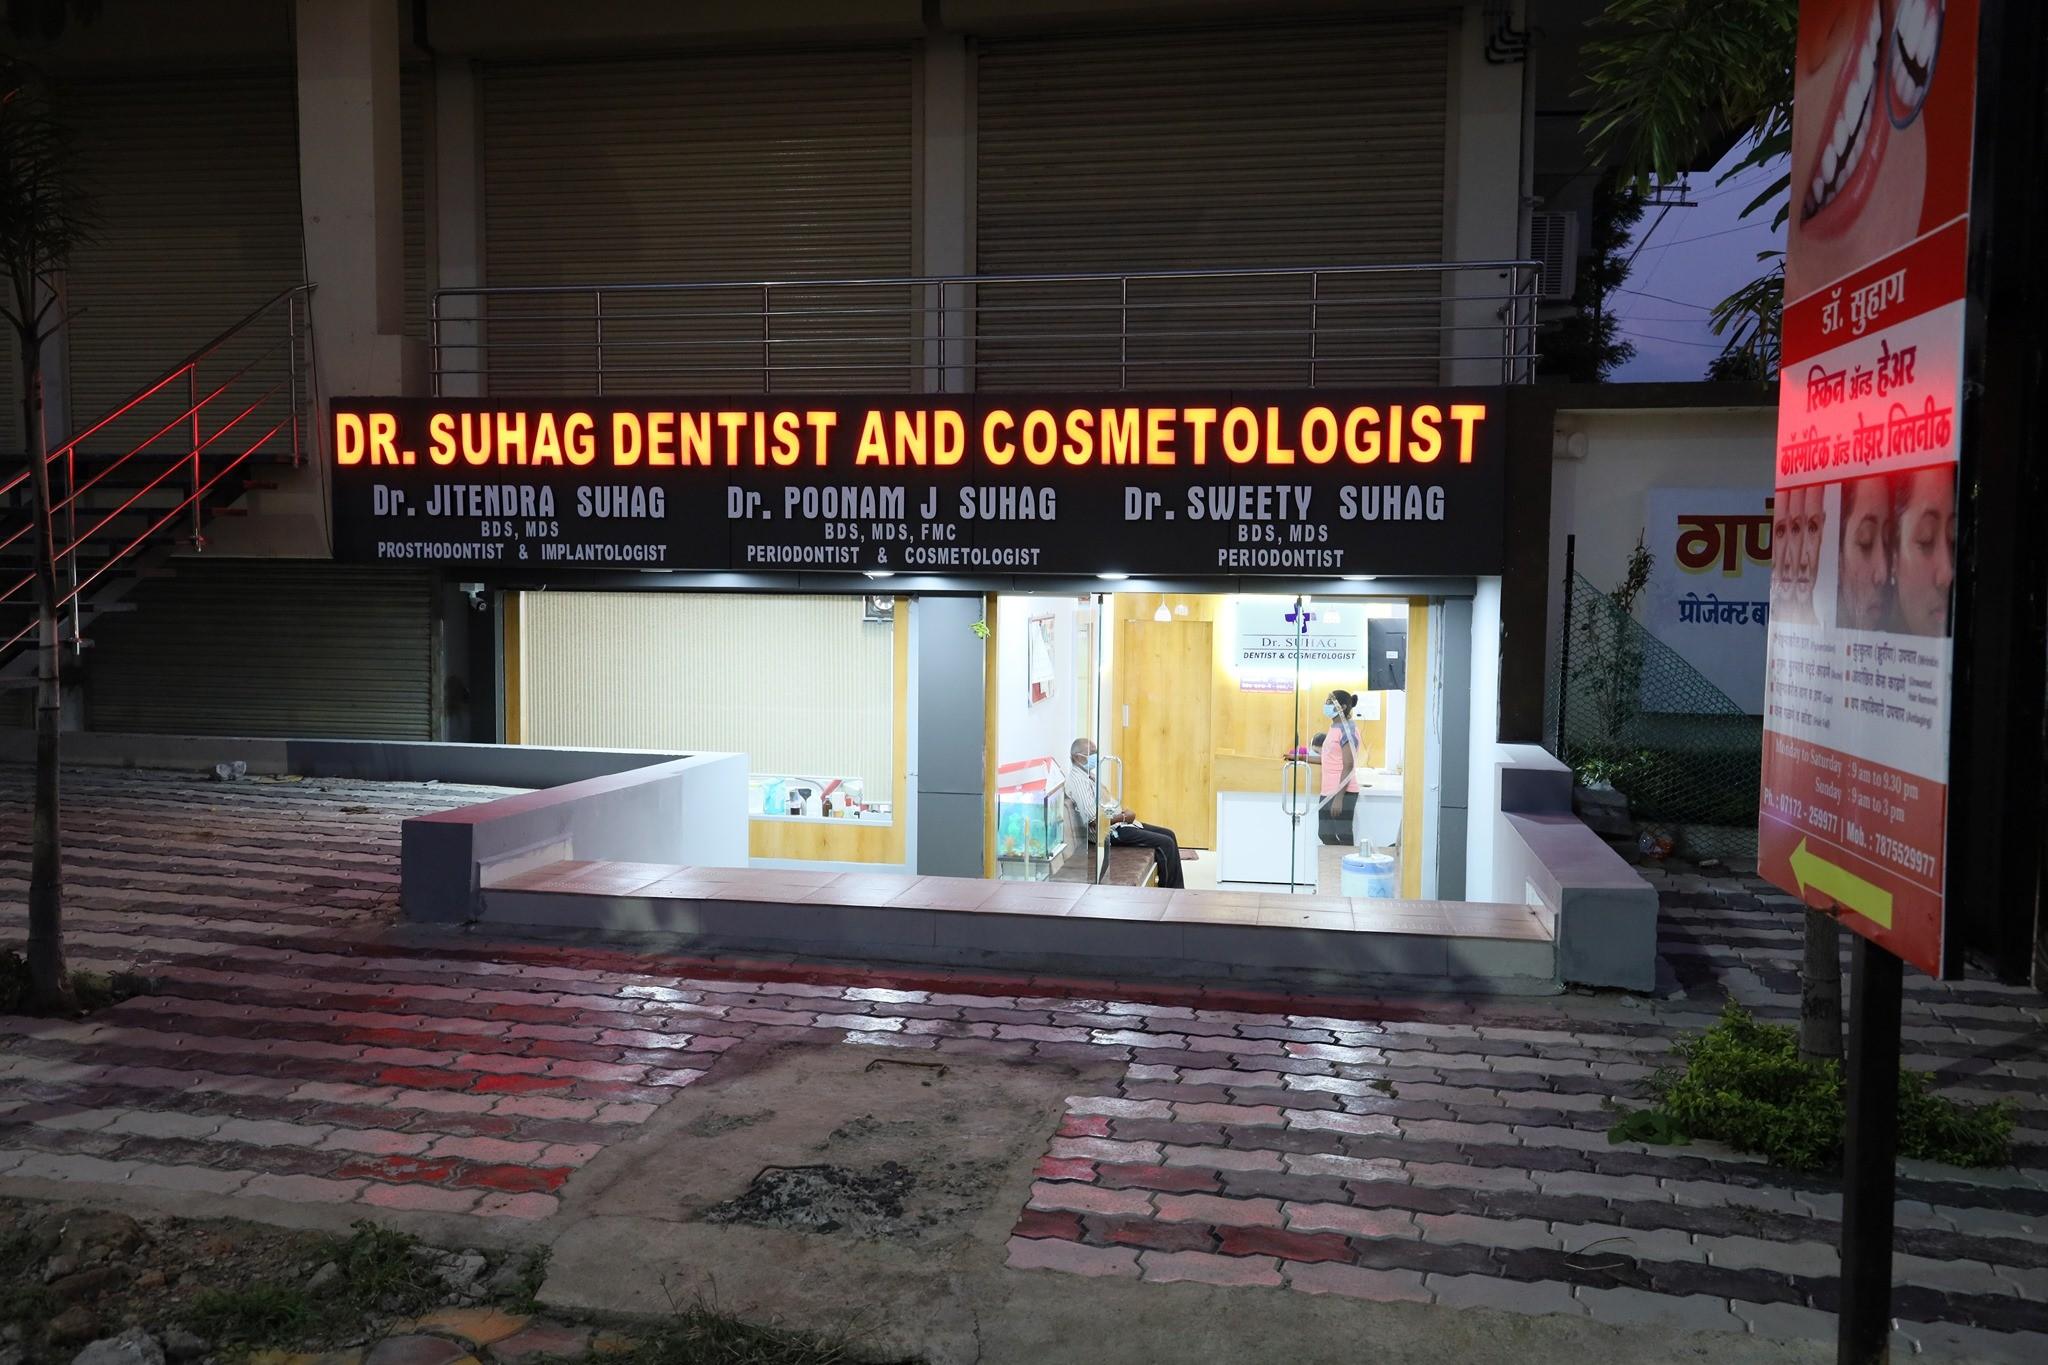 Dr. Suhag Dentist